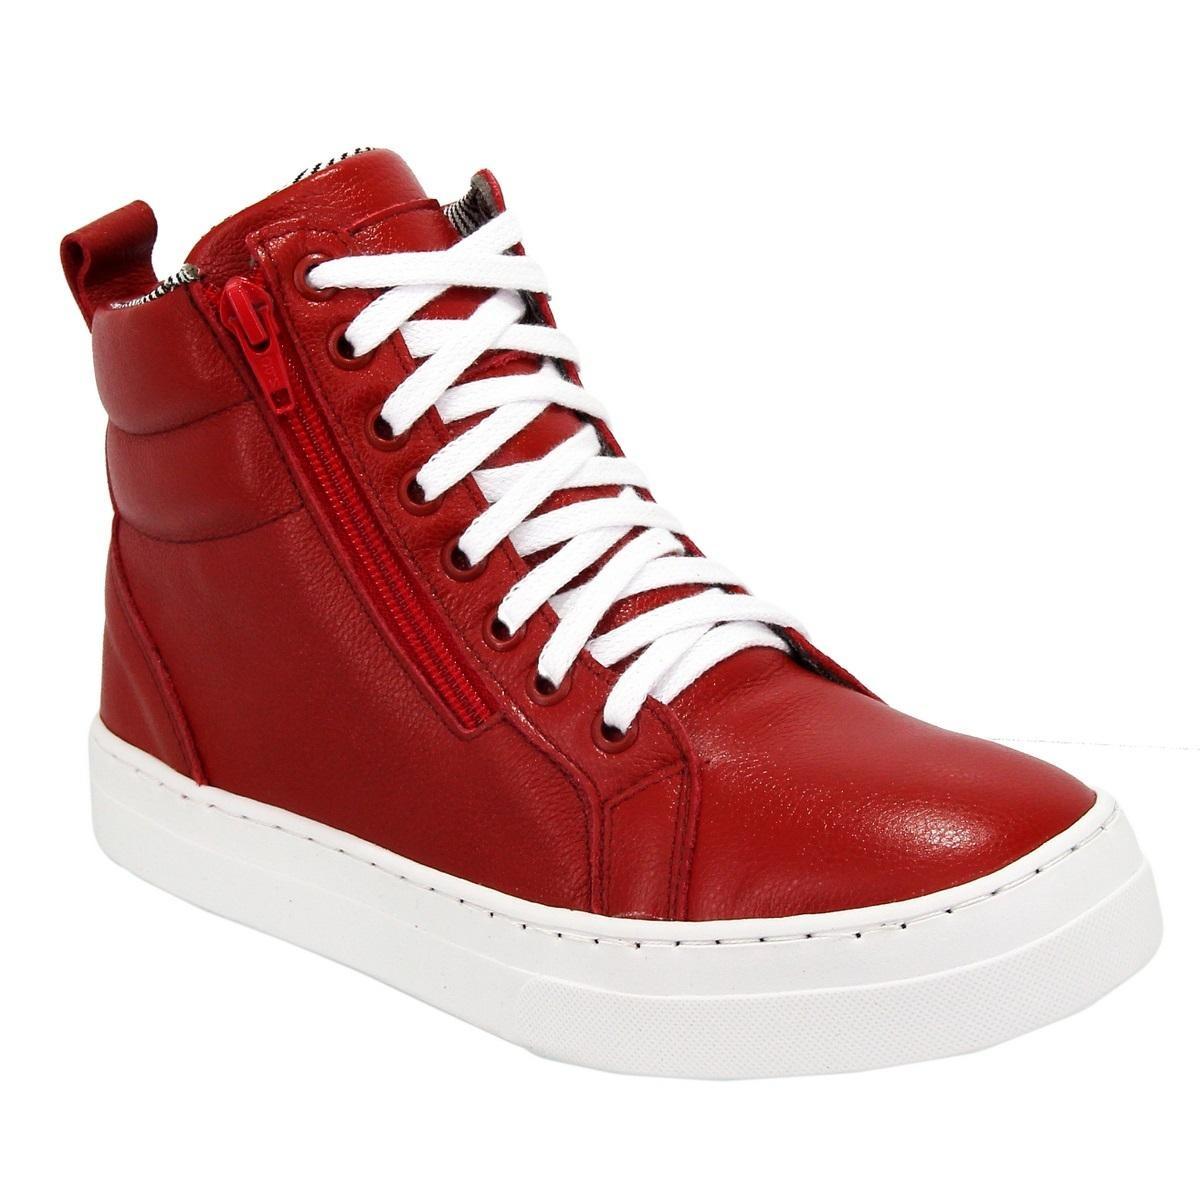 4daa3ae9ea bota sneaker feminina em couro treino fitness selten. Carregando zoom.